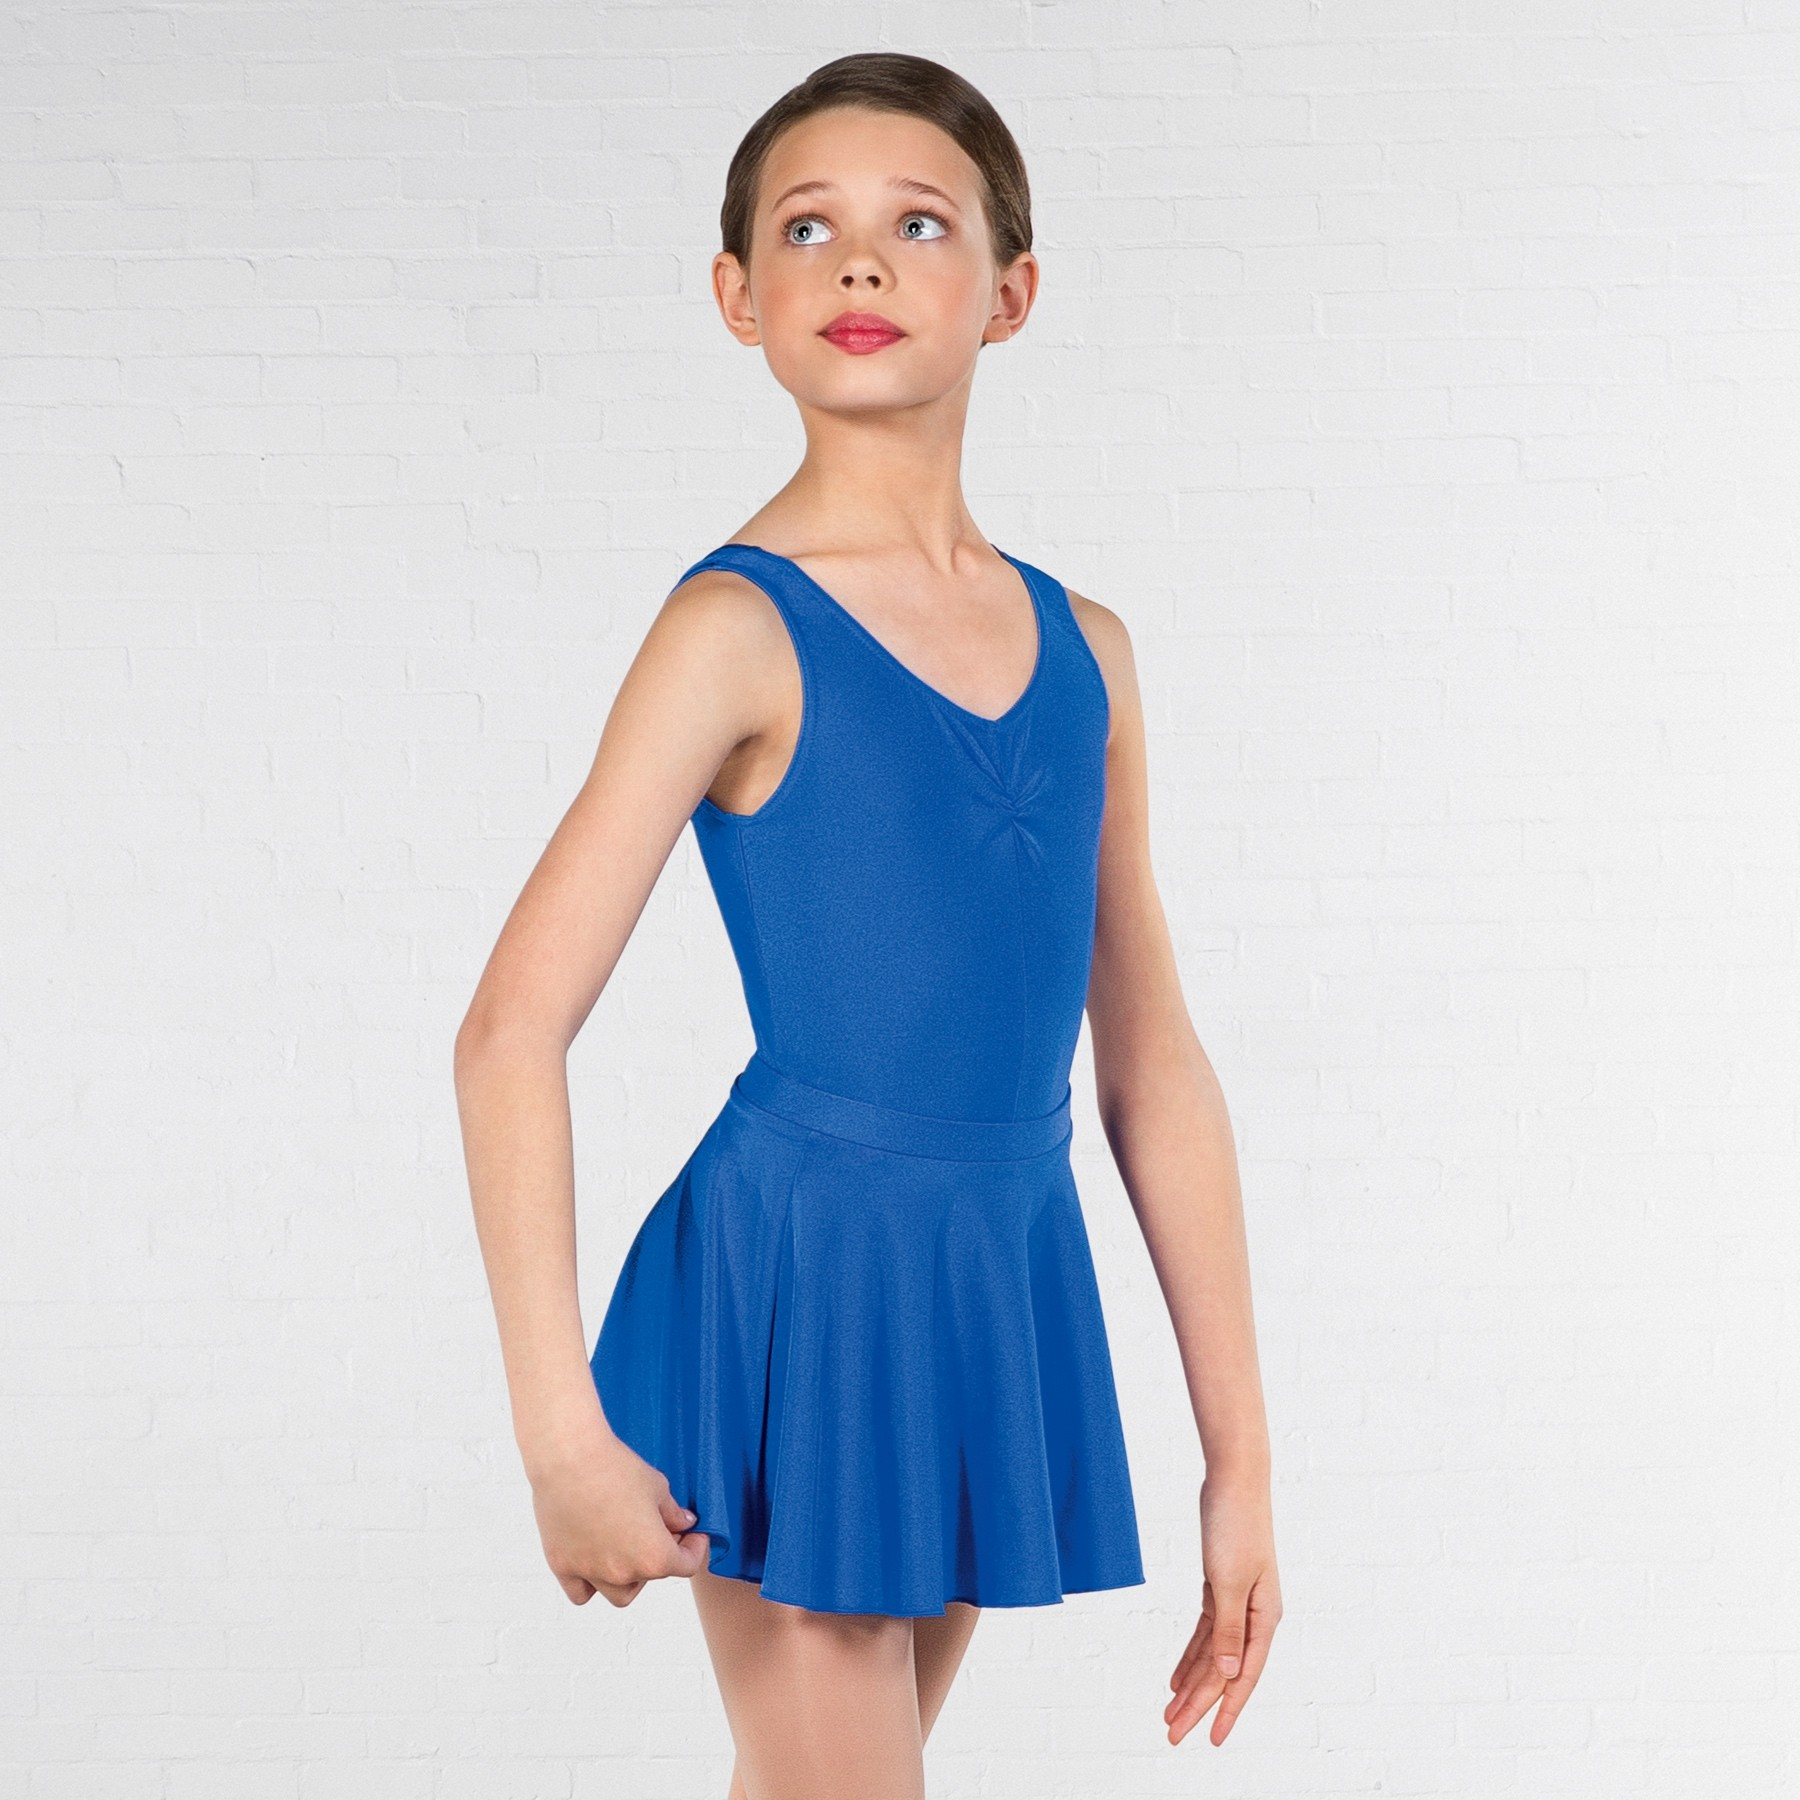 1st Position Circular Skirt (Royal Blue)